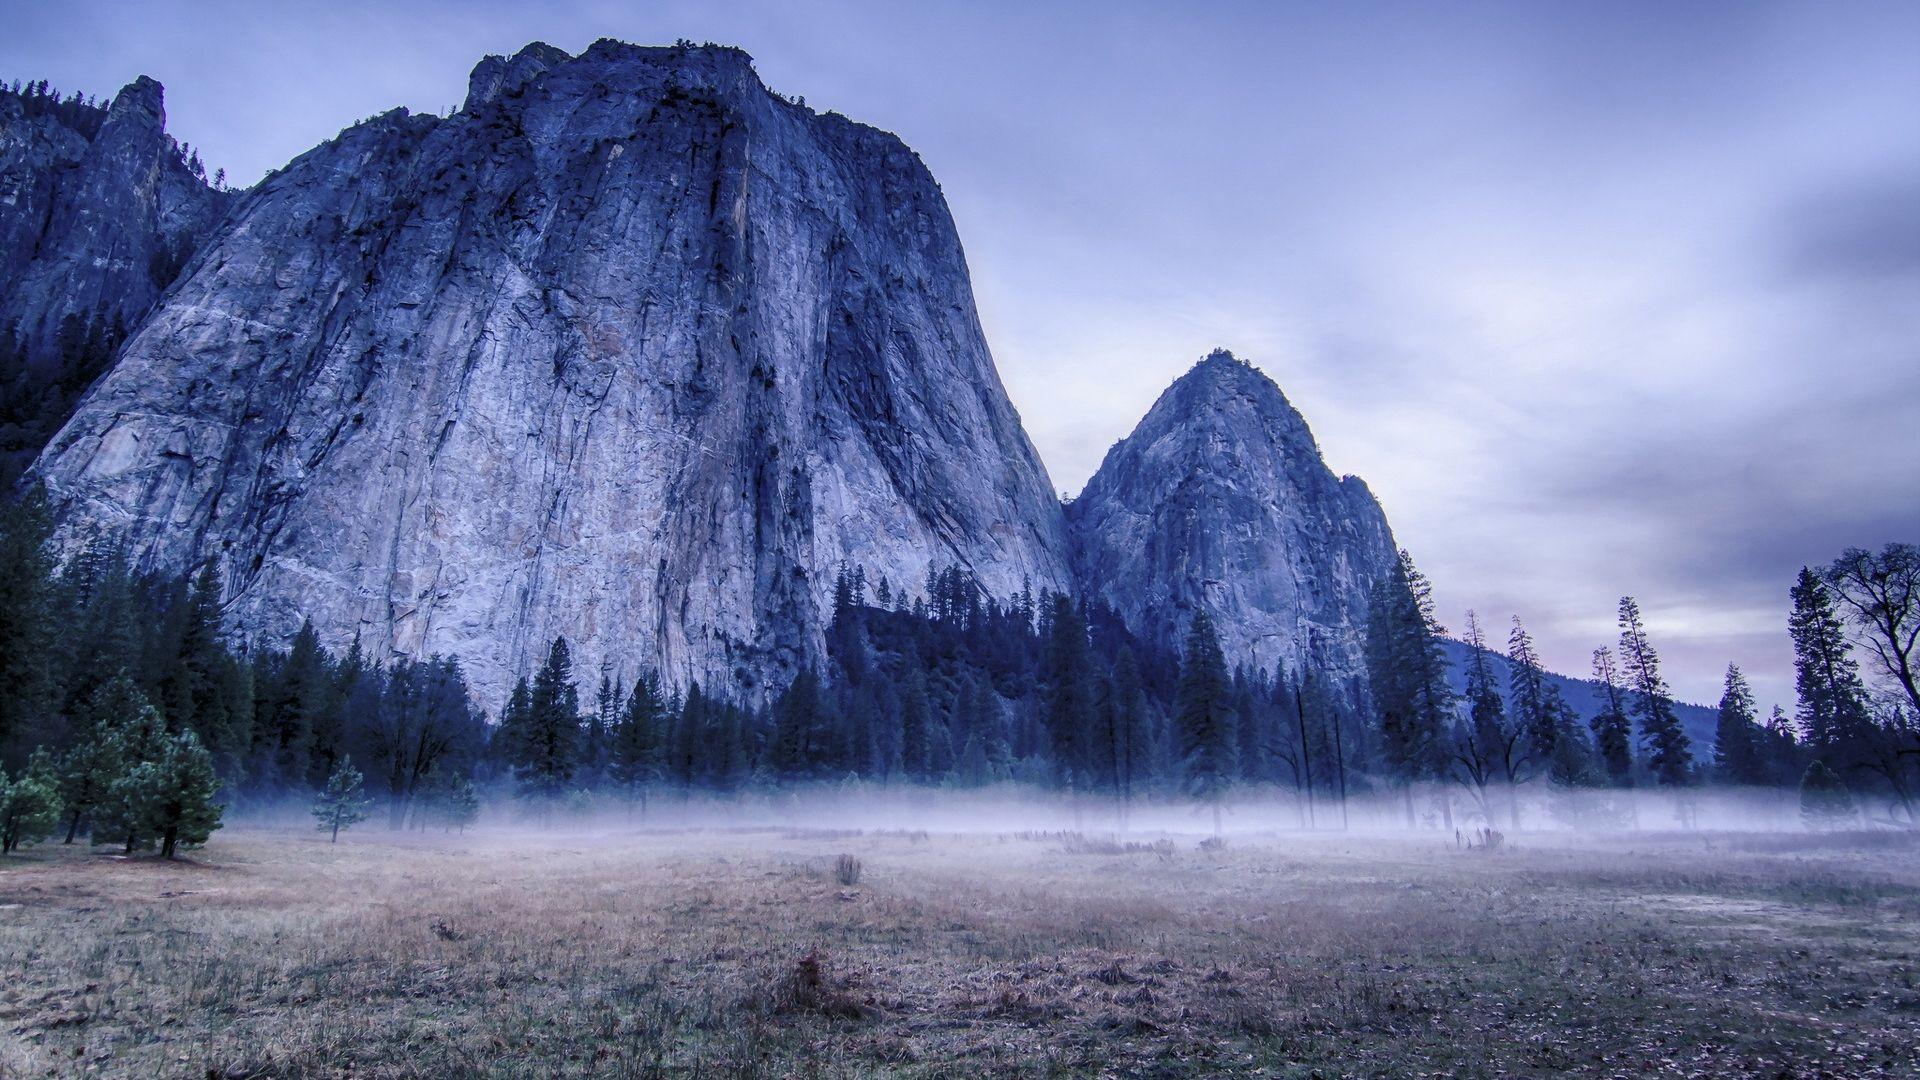 Yosemite download nice wallpaper